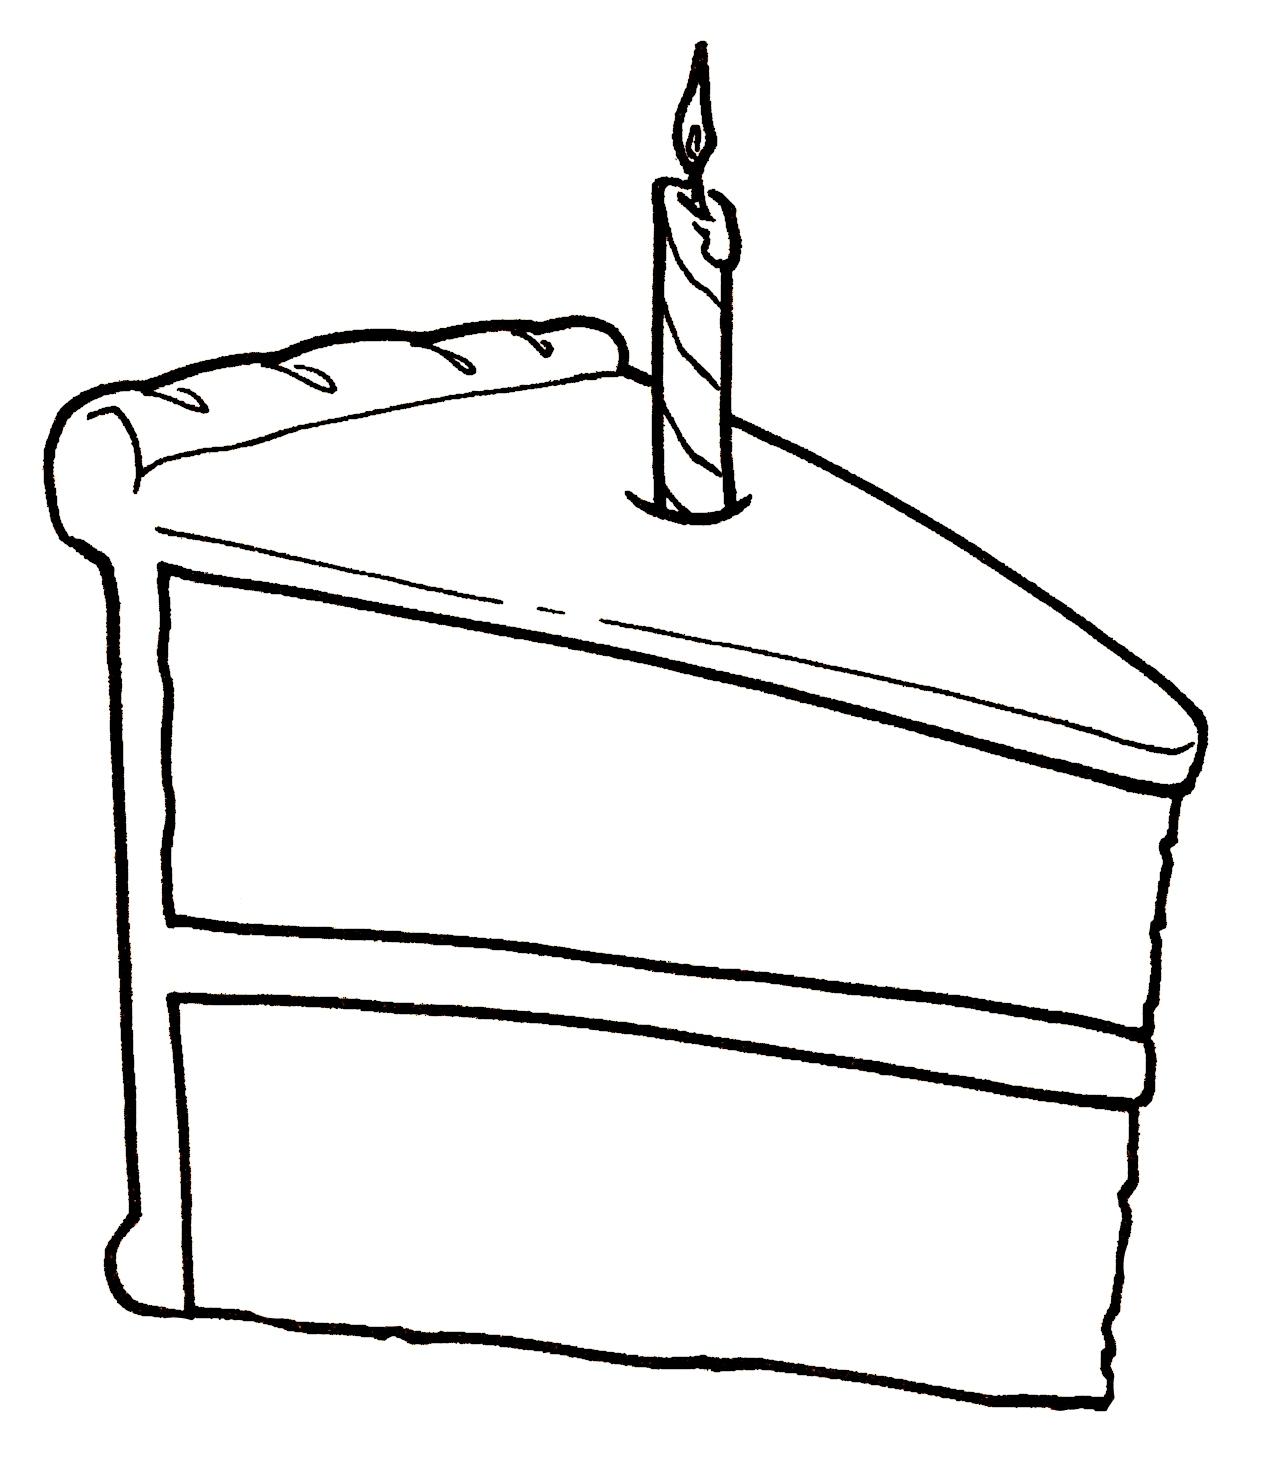 Slice Of Cake Drawing At Getdrawings